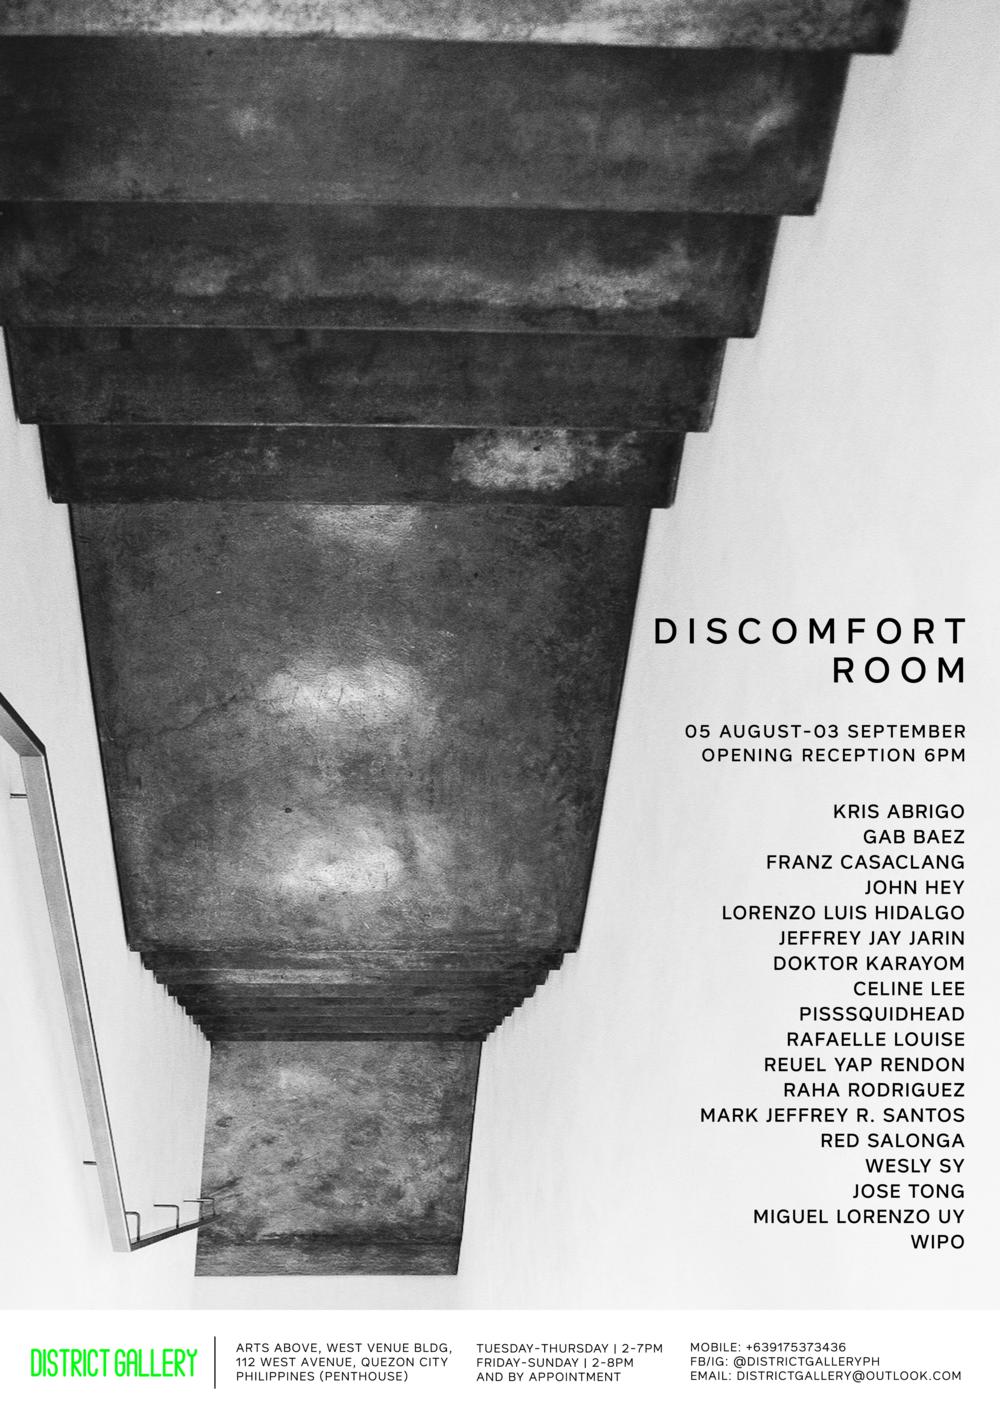 dicomfort-room-poster.png